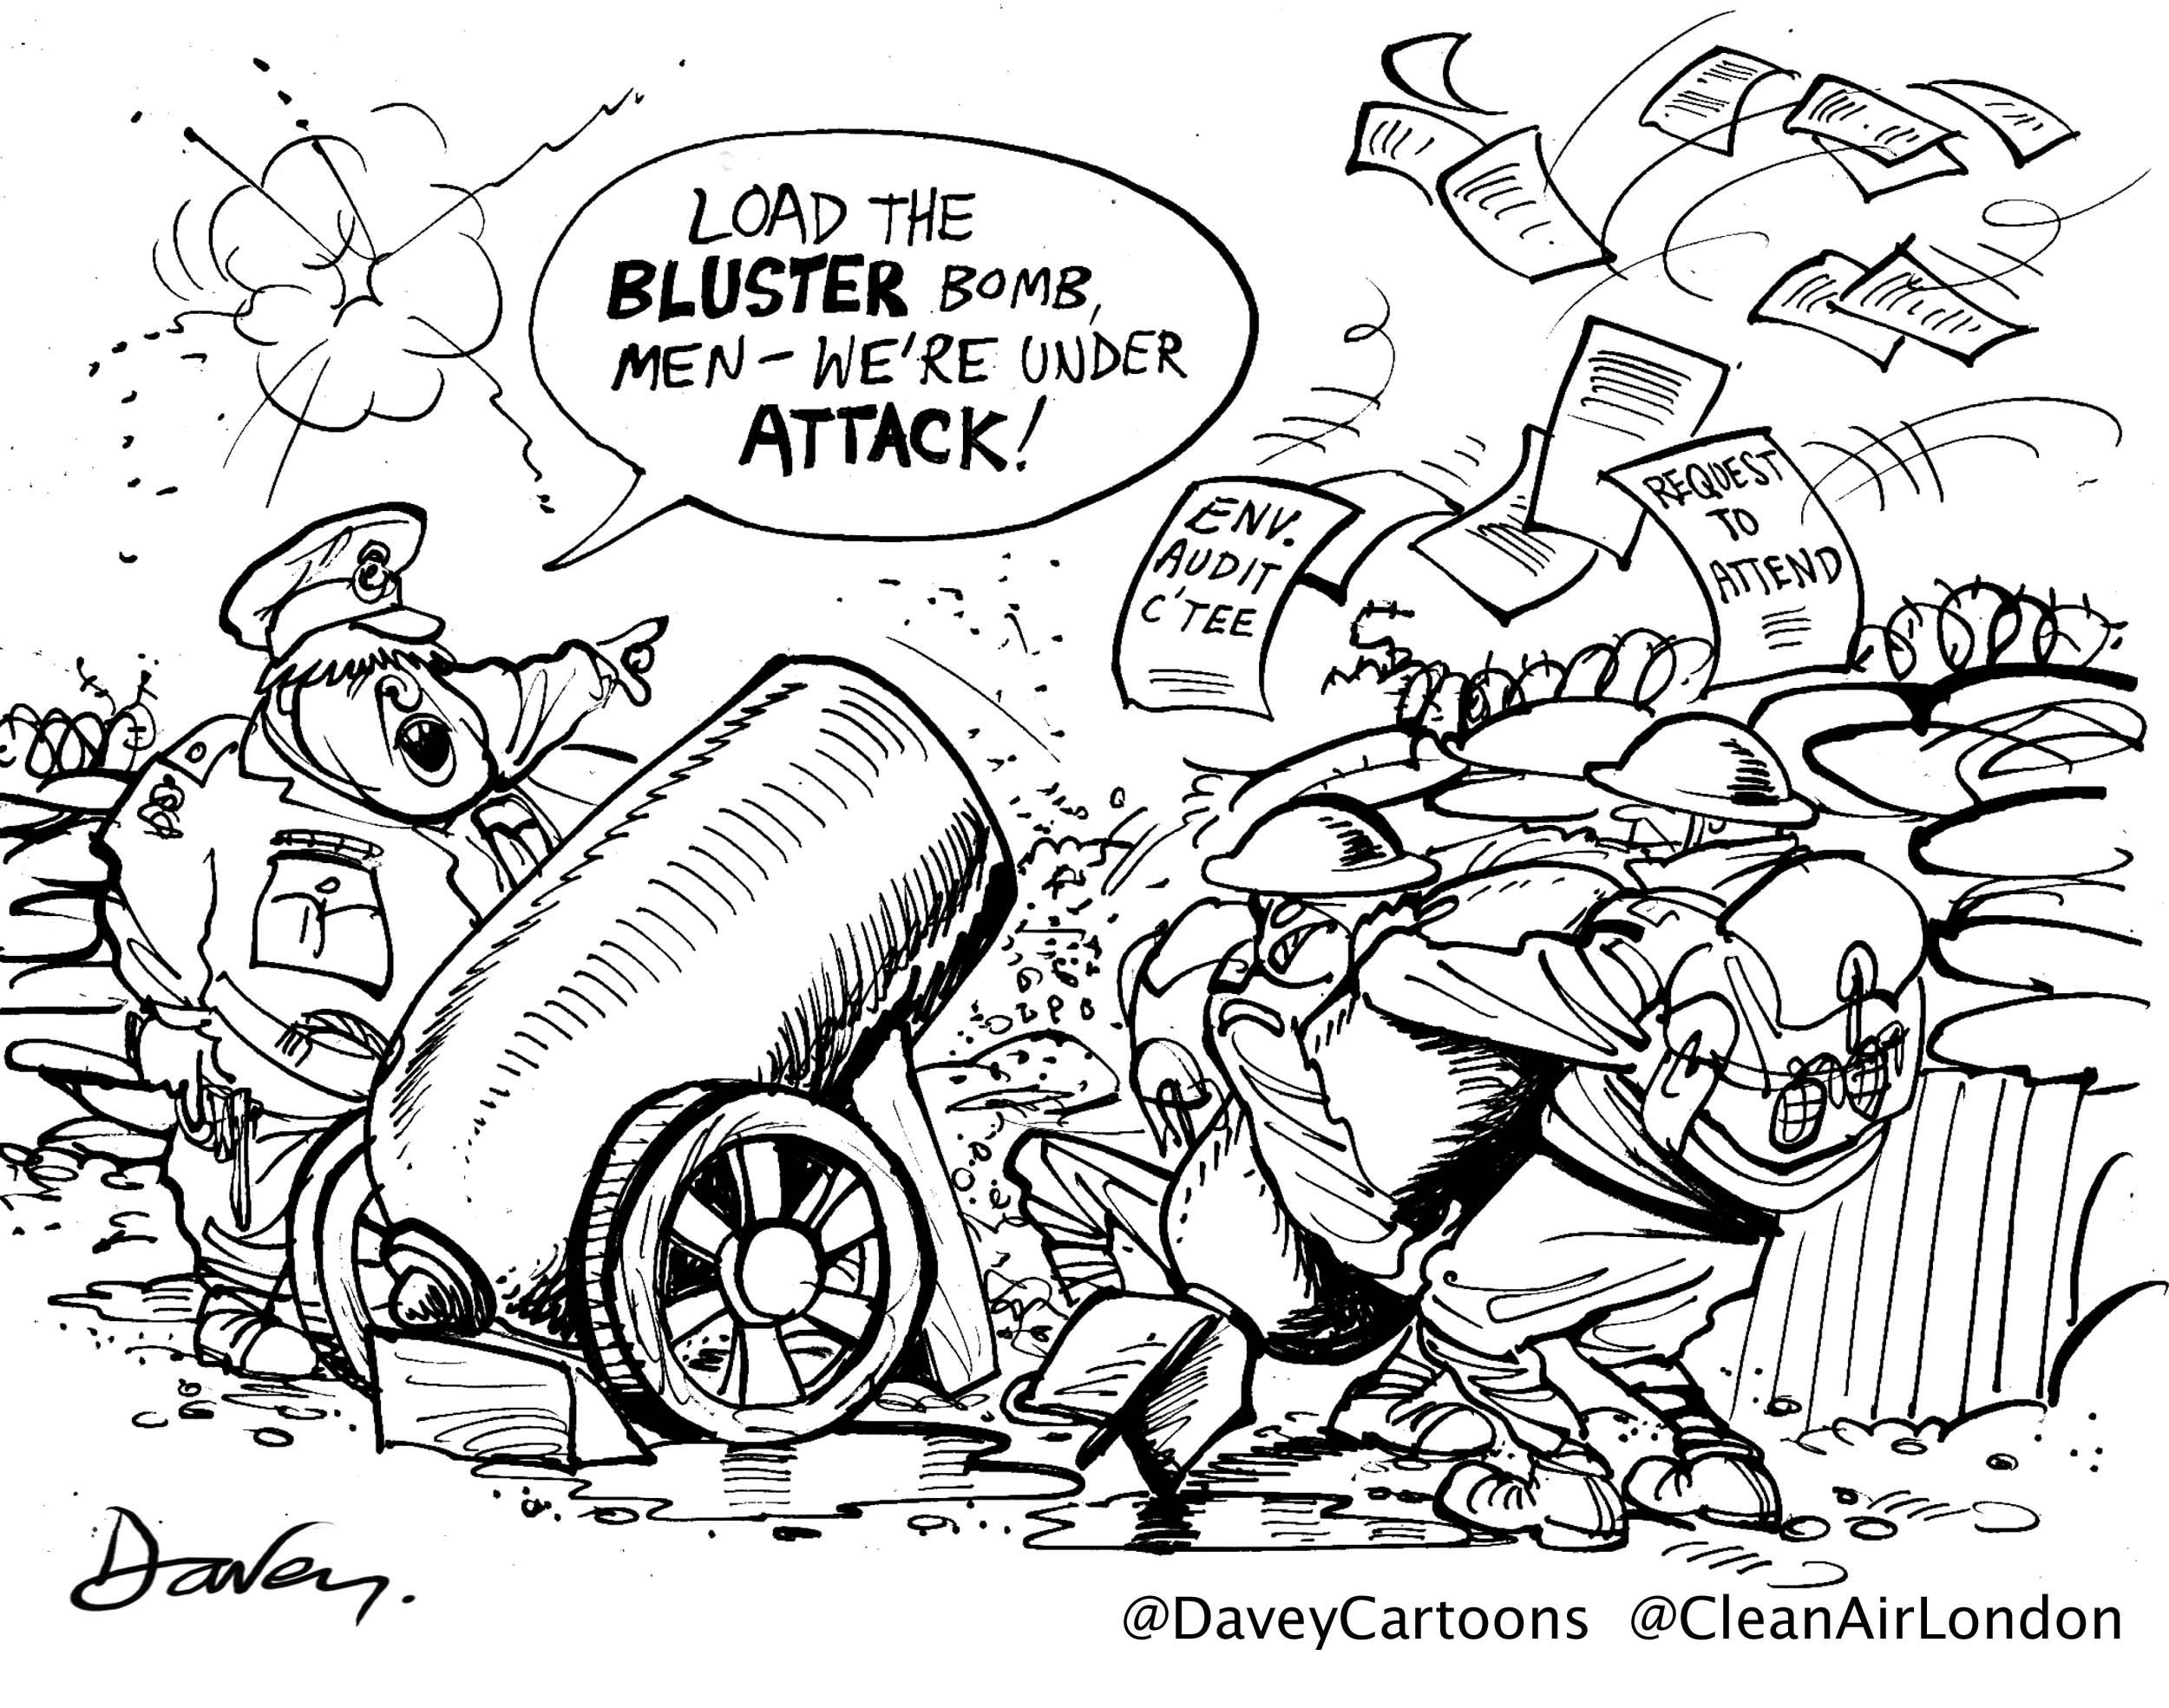 Bluster bomb 030514